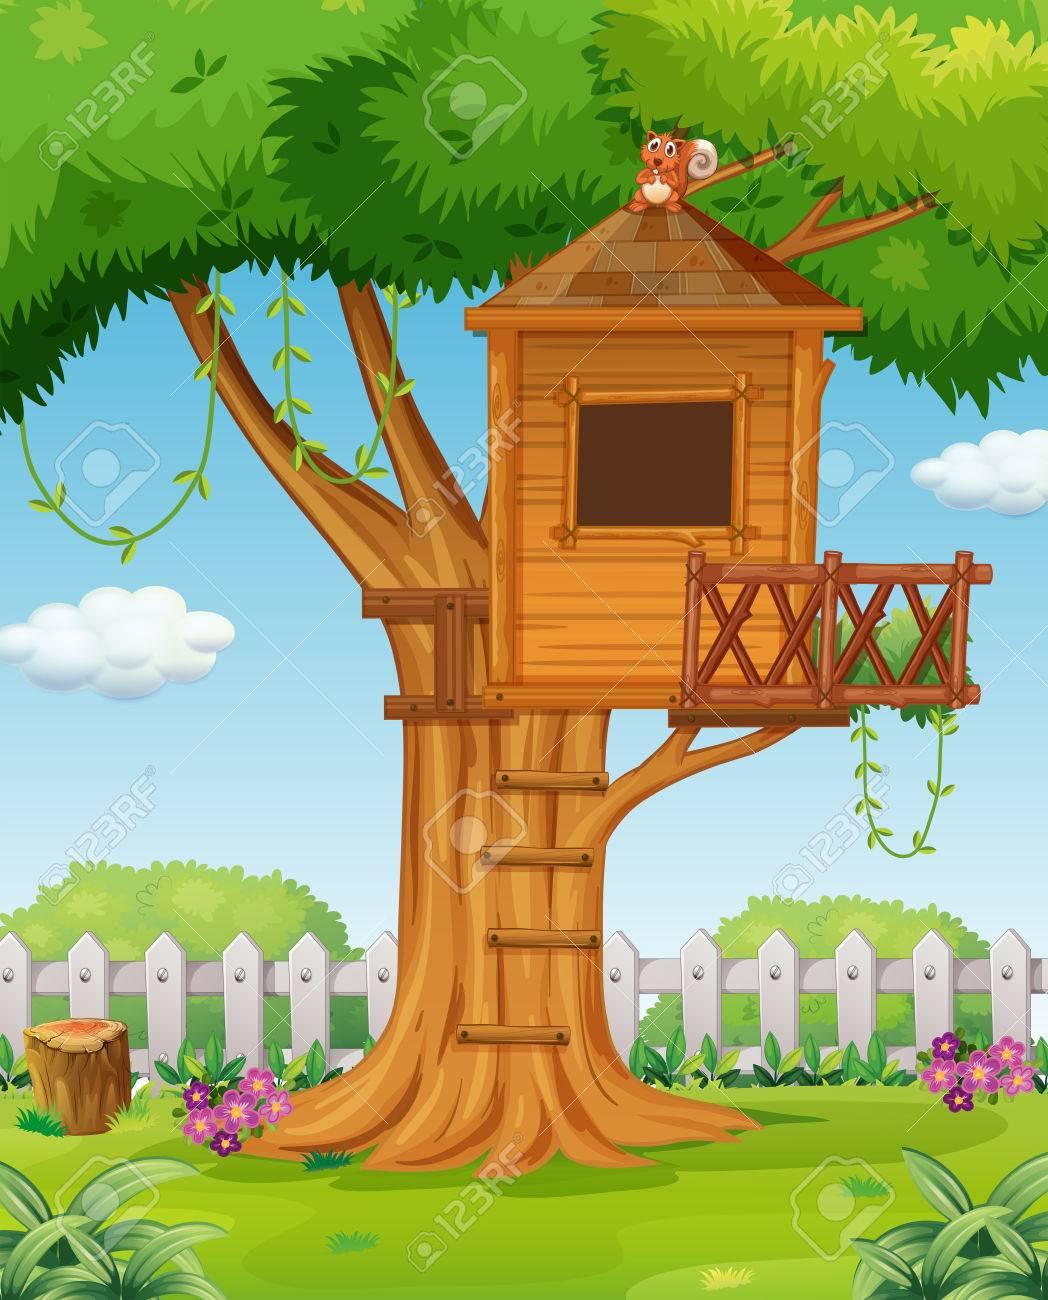 Treehouse in the garden illustration